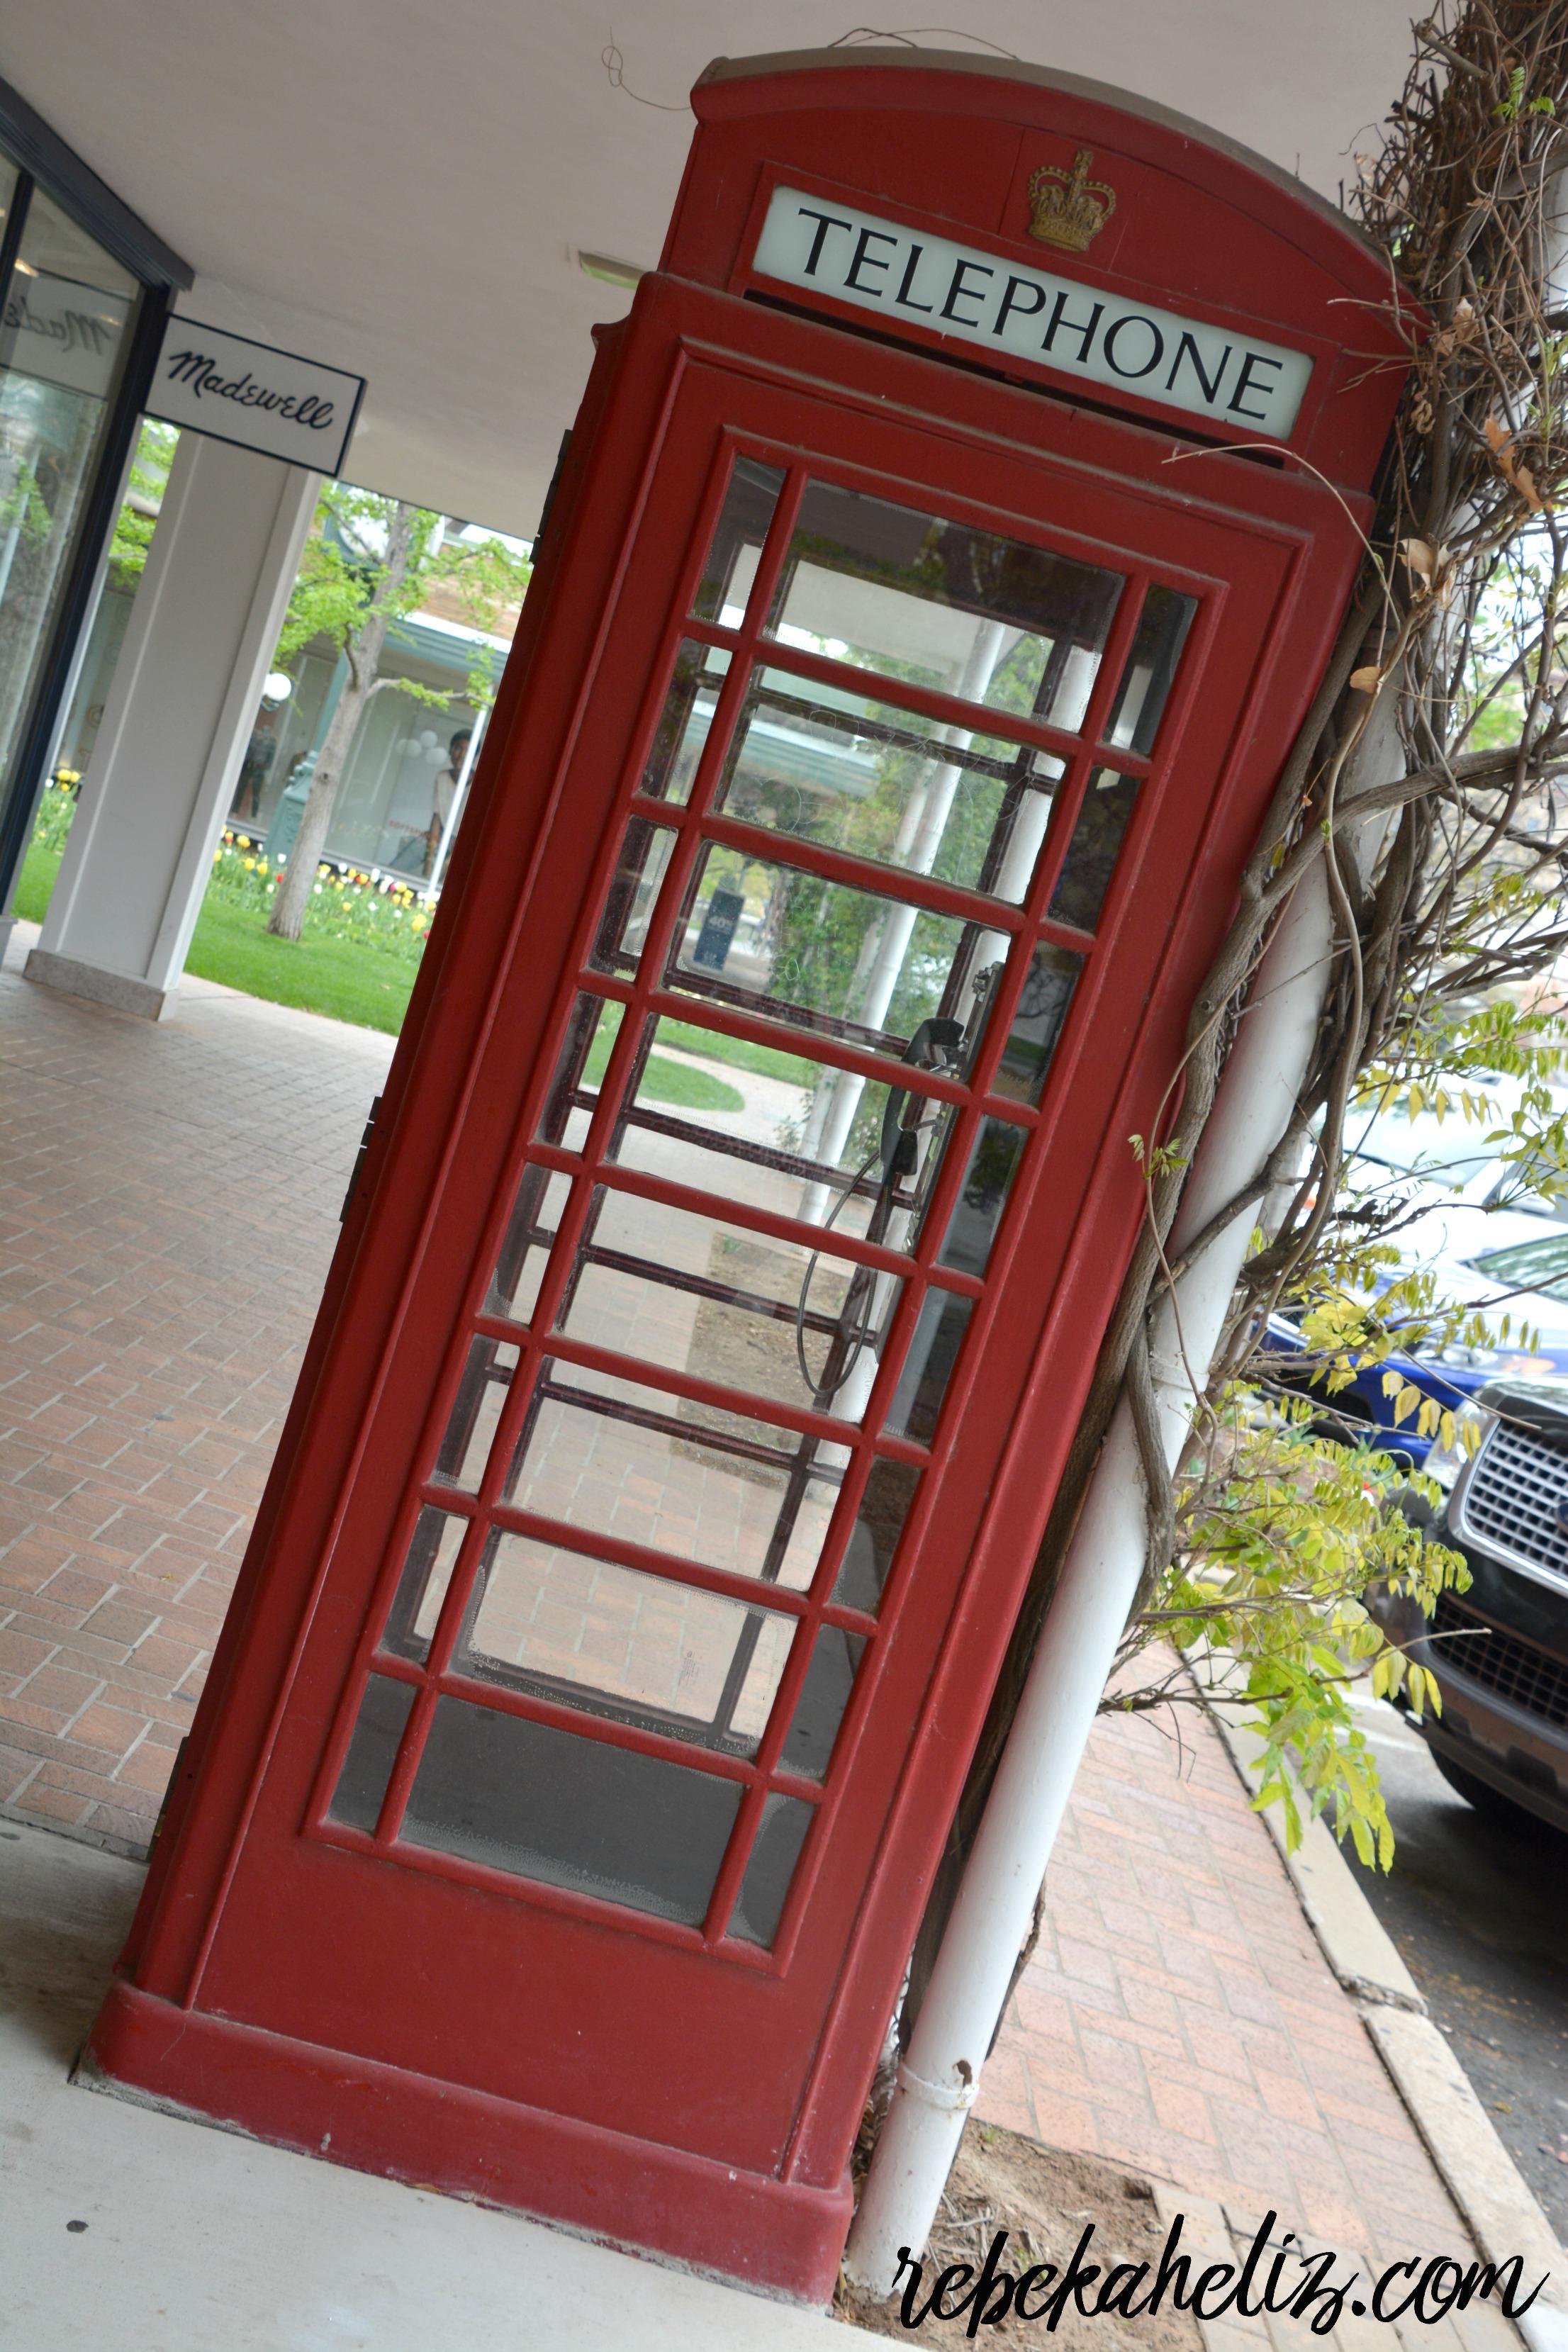 road trip, tulsa oklahoma, tulsa, oklahoma, utica square, phone booth